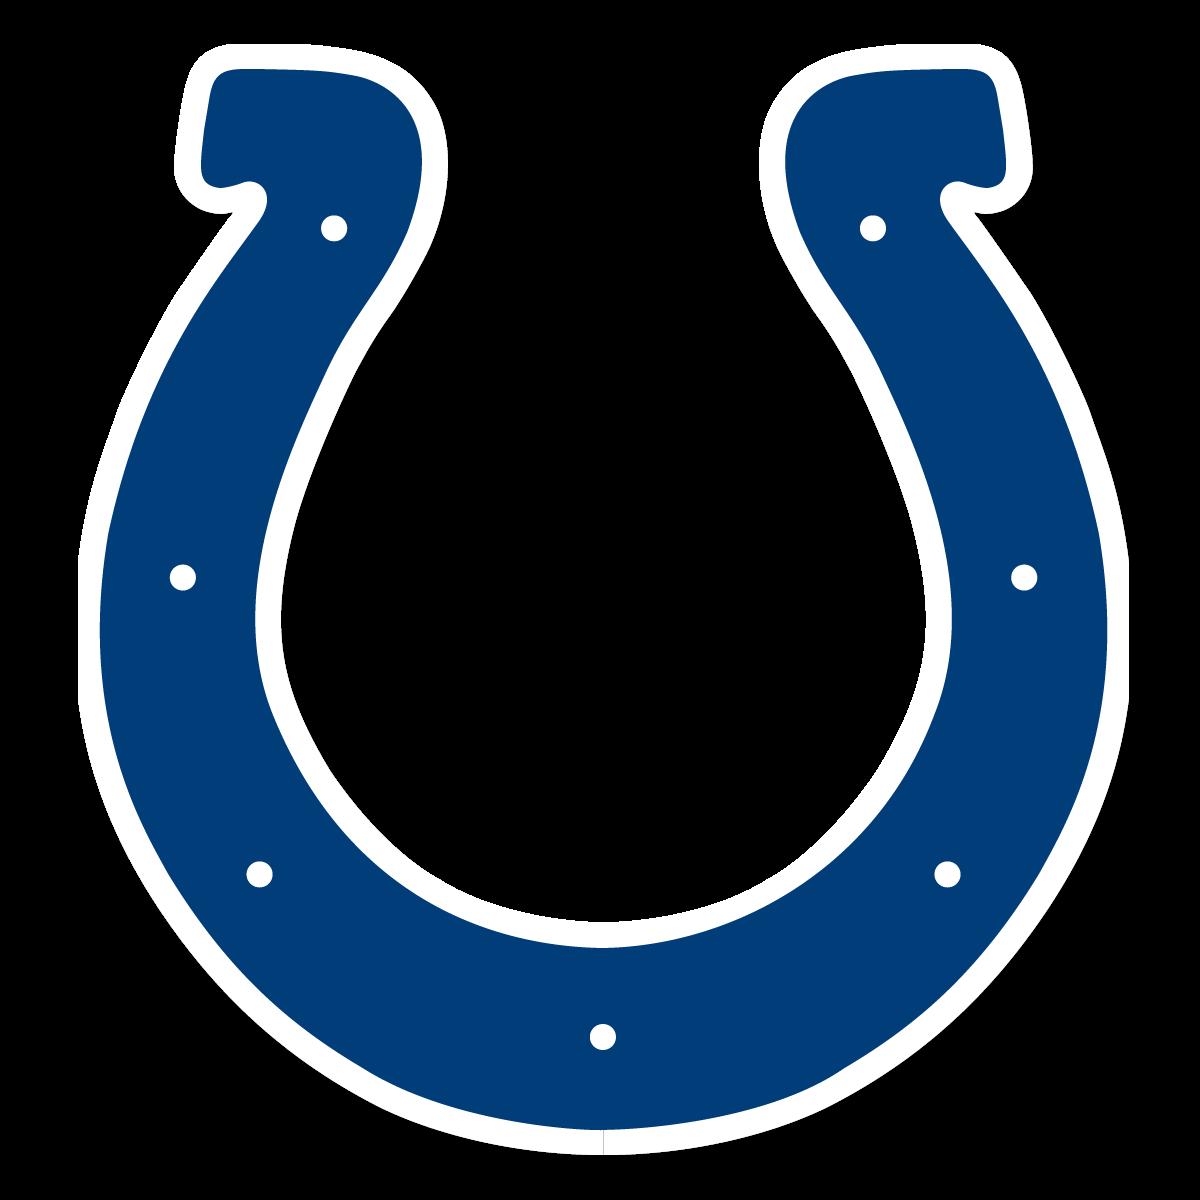 Horseshoe clipart transparent background. Indianapolis colts logo png